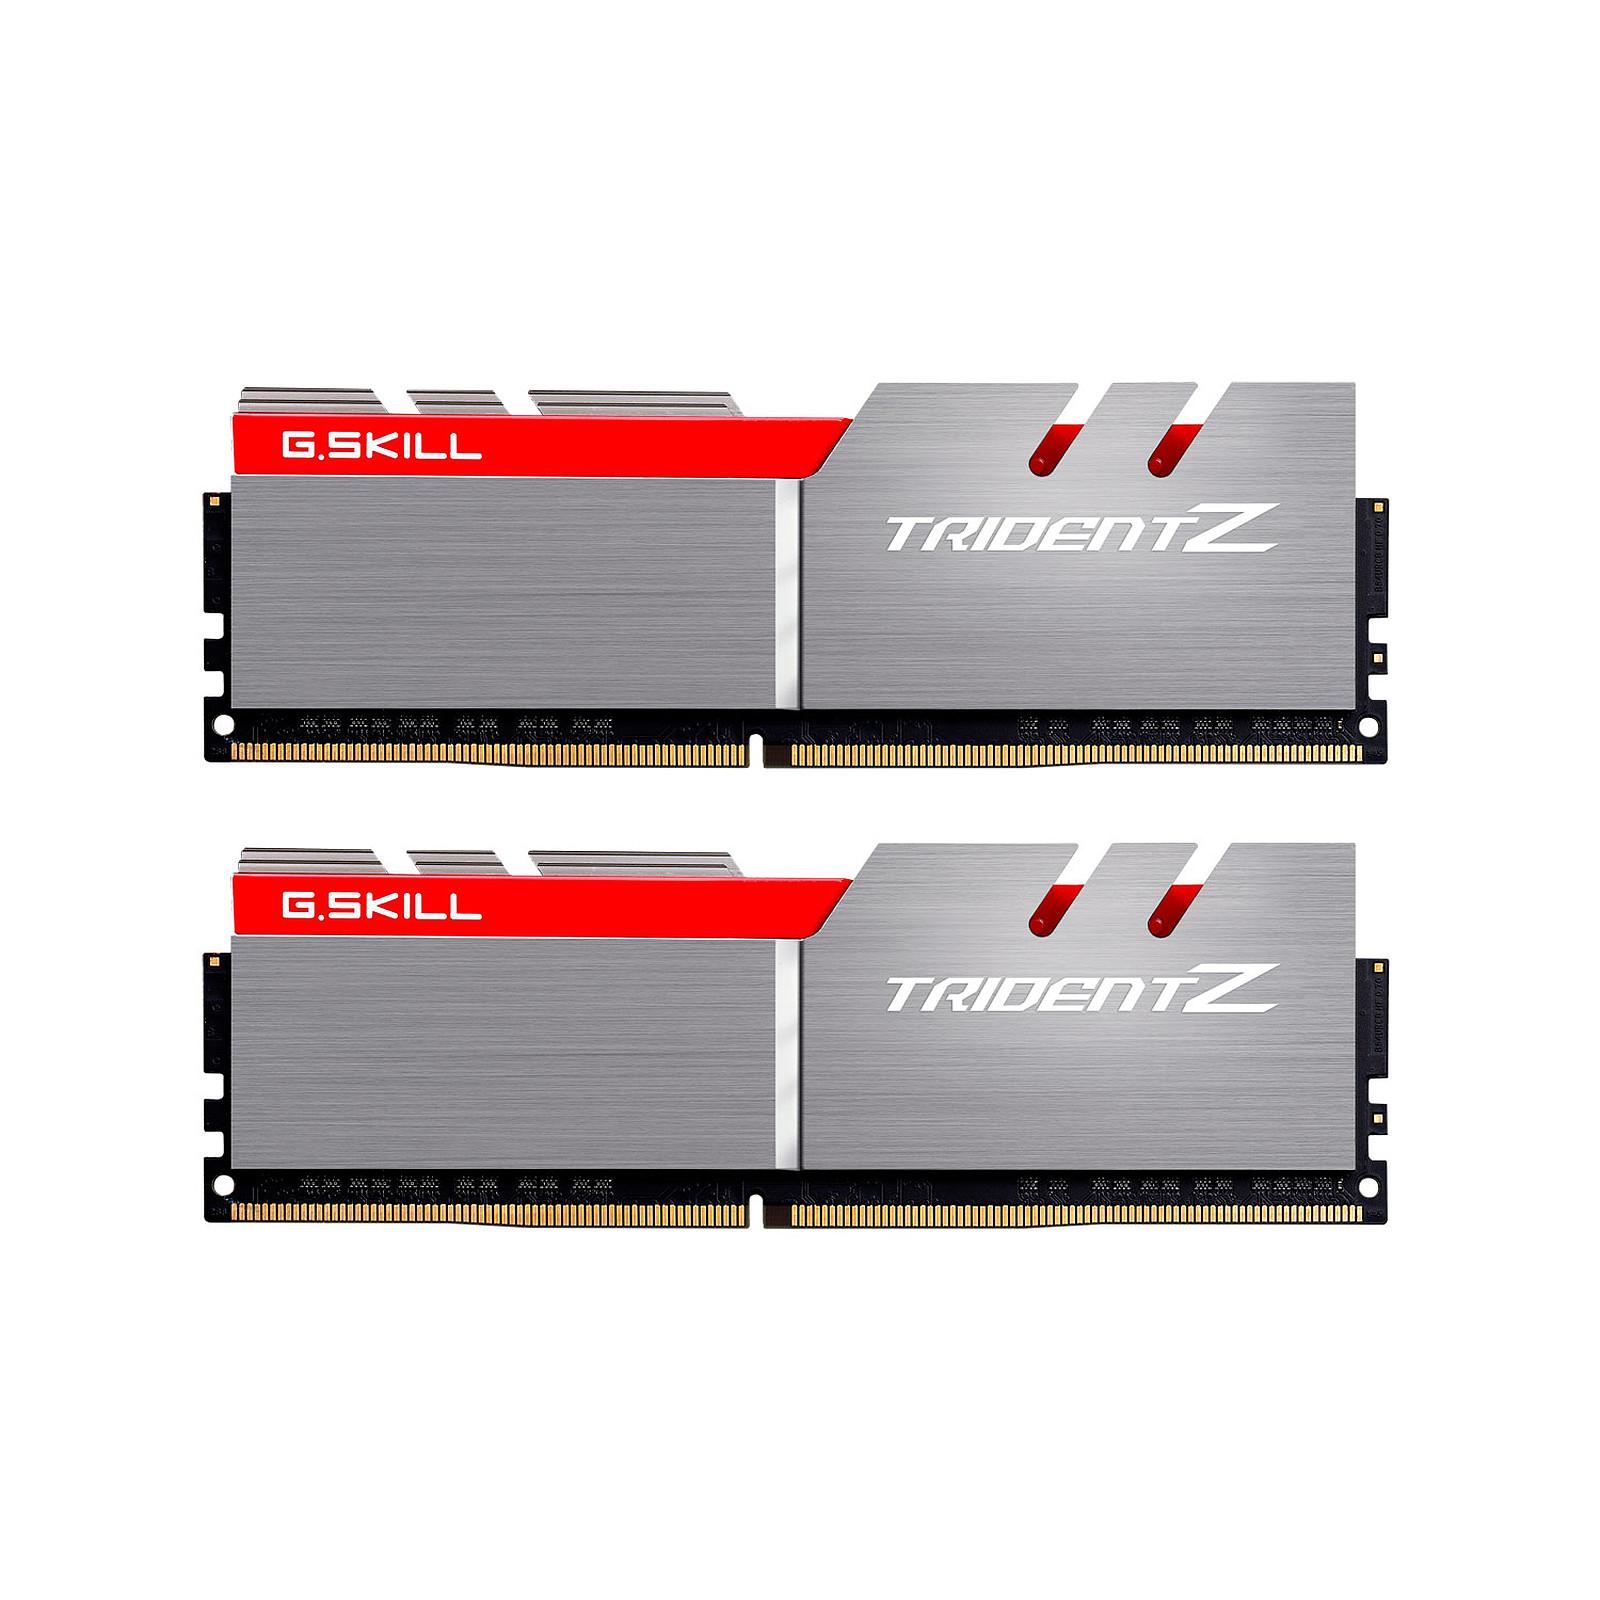 G.Skill Trident Z 16 Go (2x 8 Go) DDR4 3866 MHz CL18